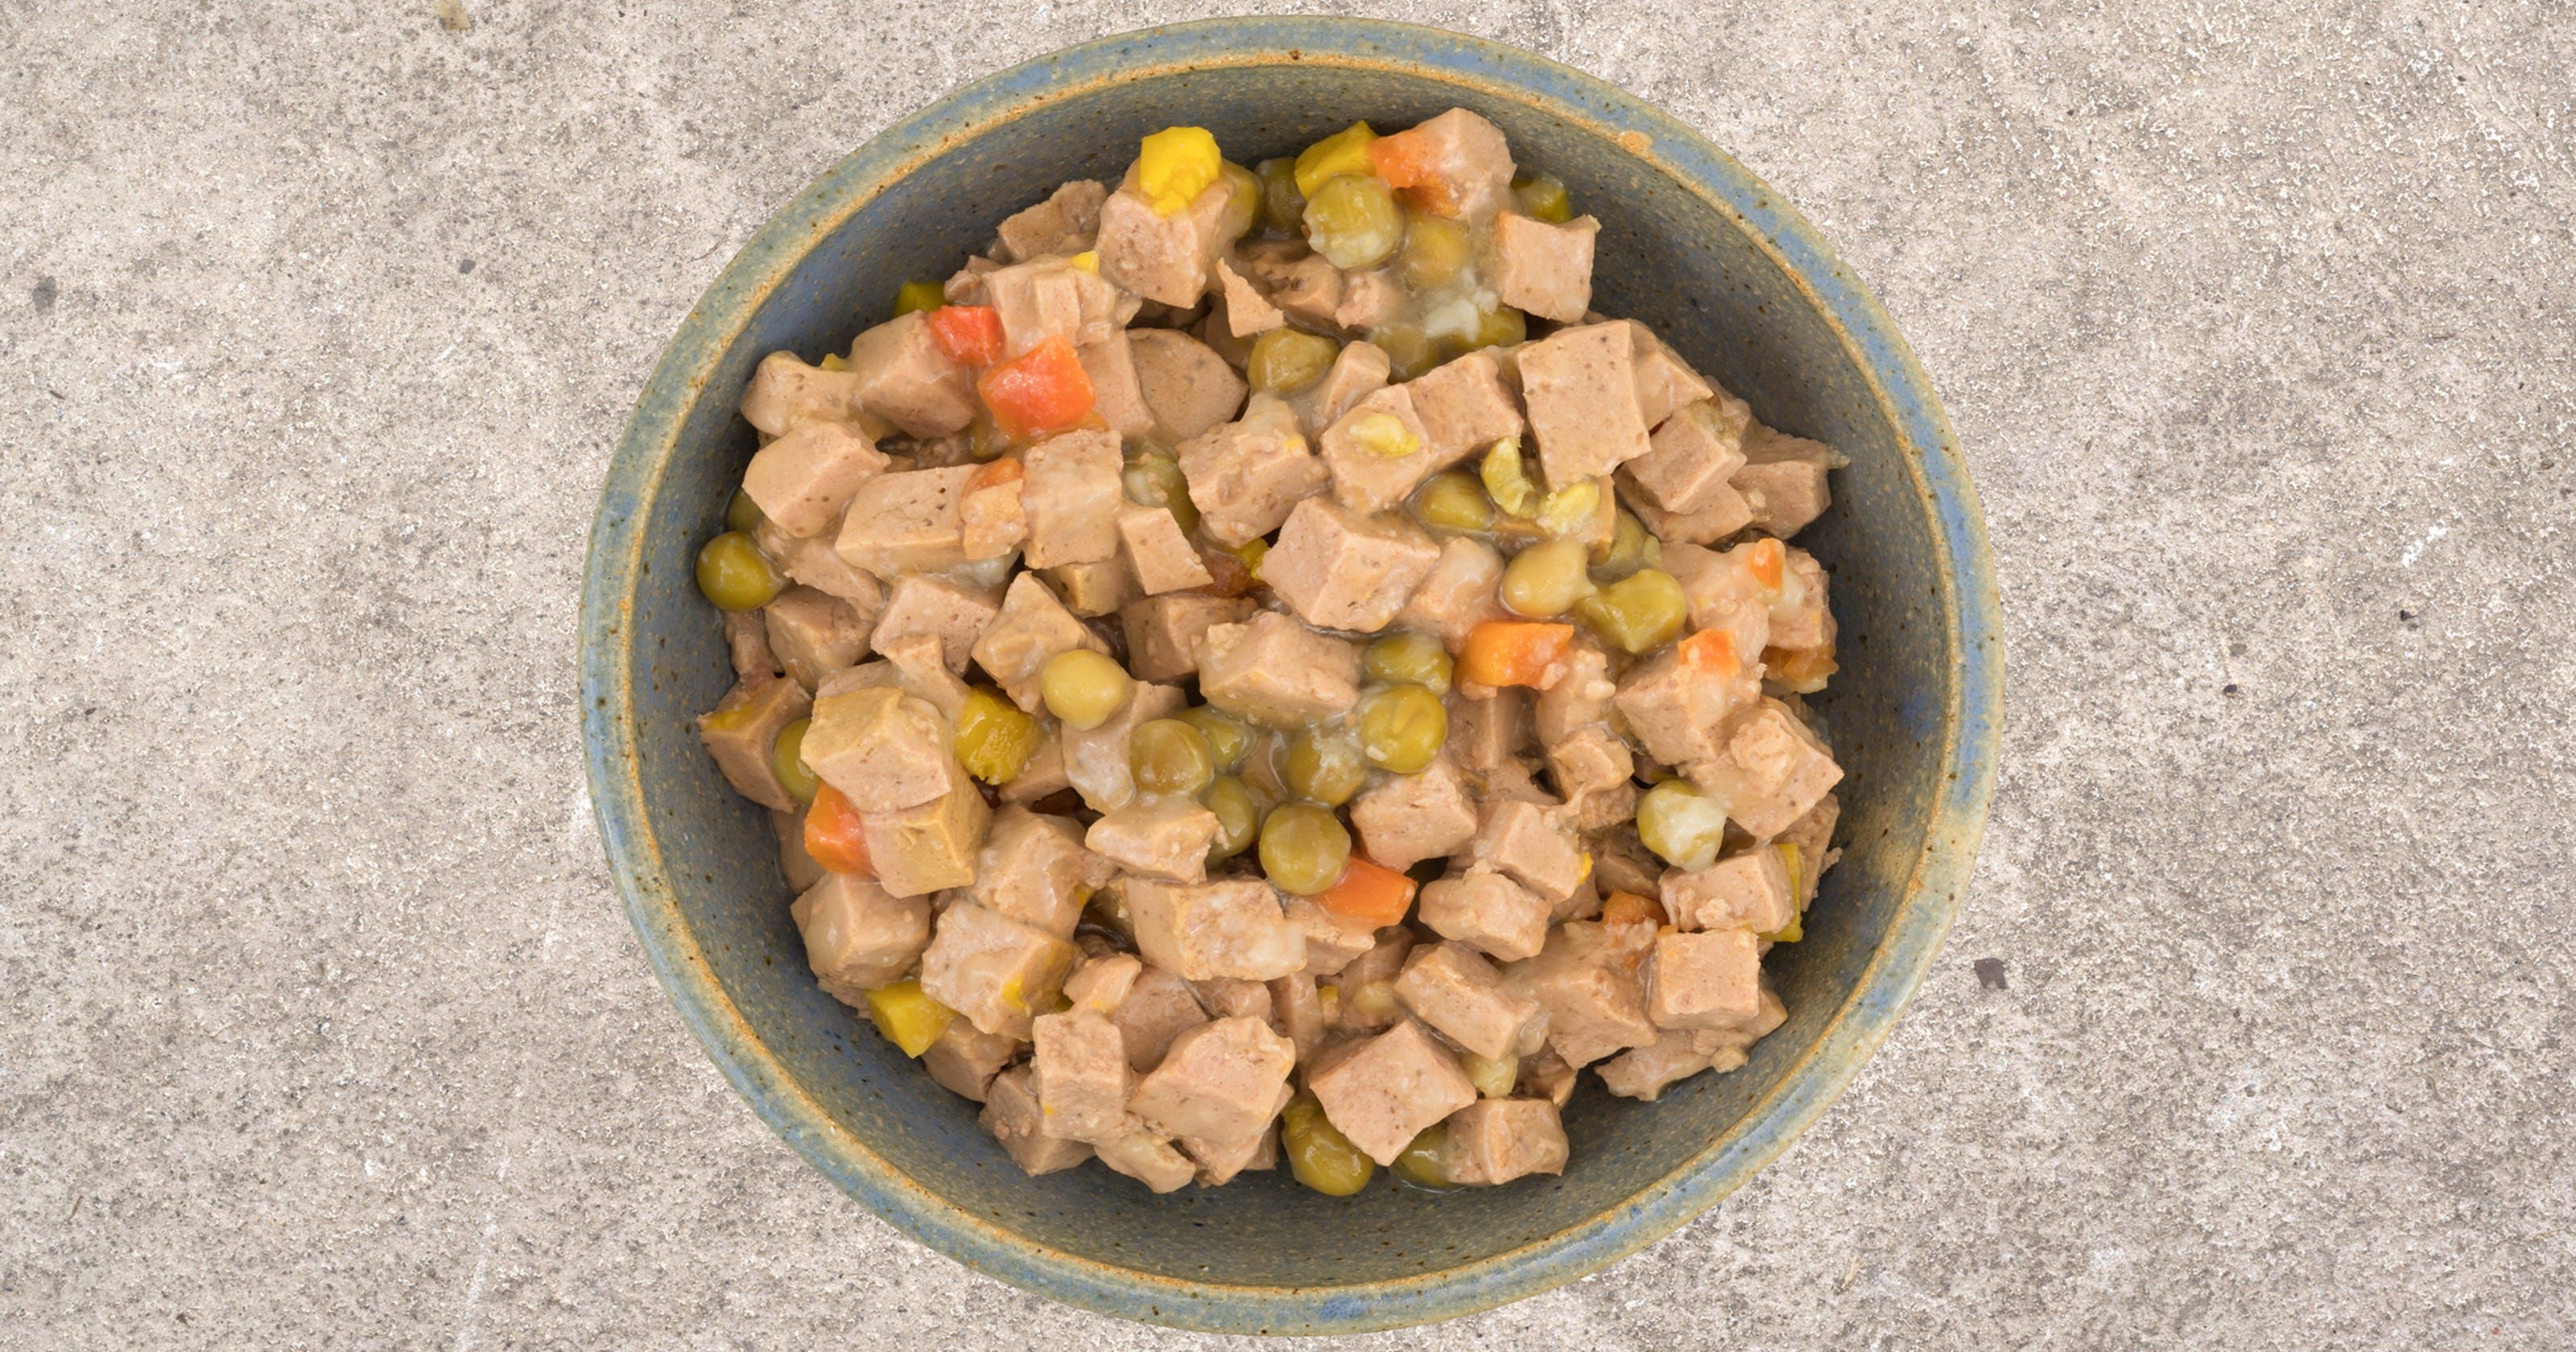 Dog Food With Euthanasia Drug